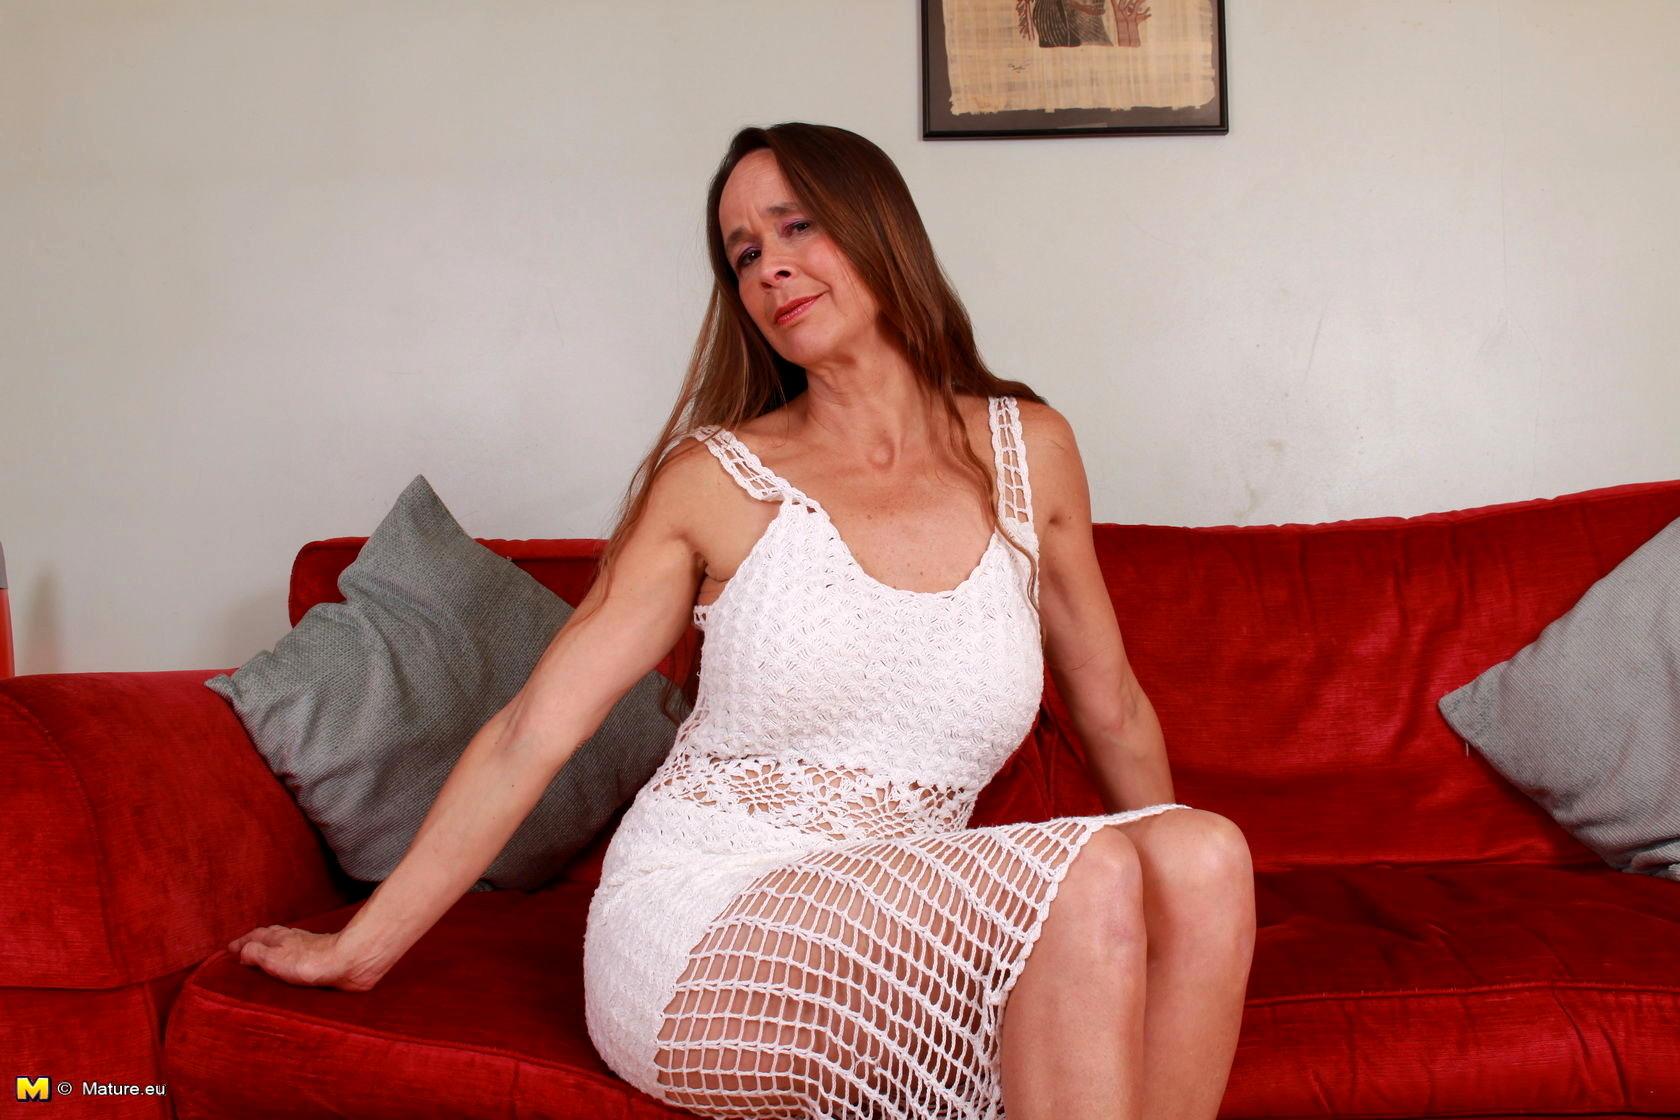 Uk female soapstar pussy pics #6